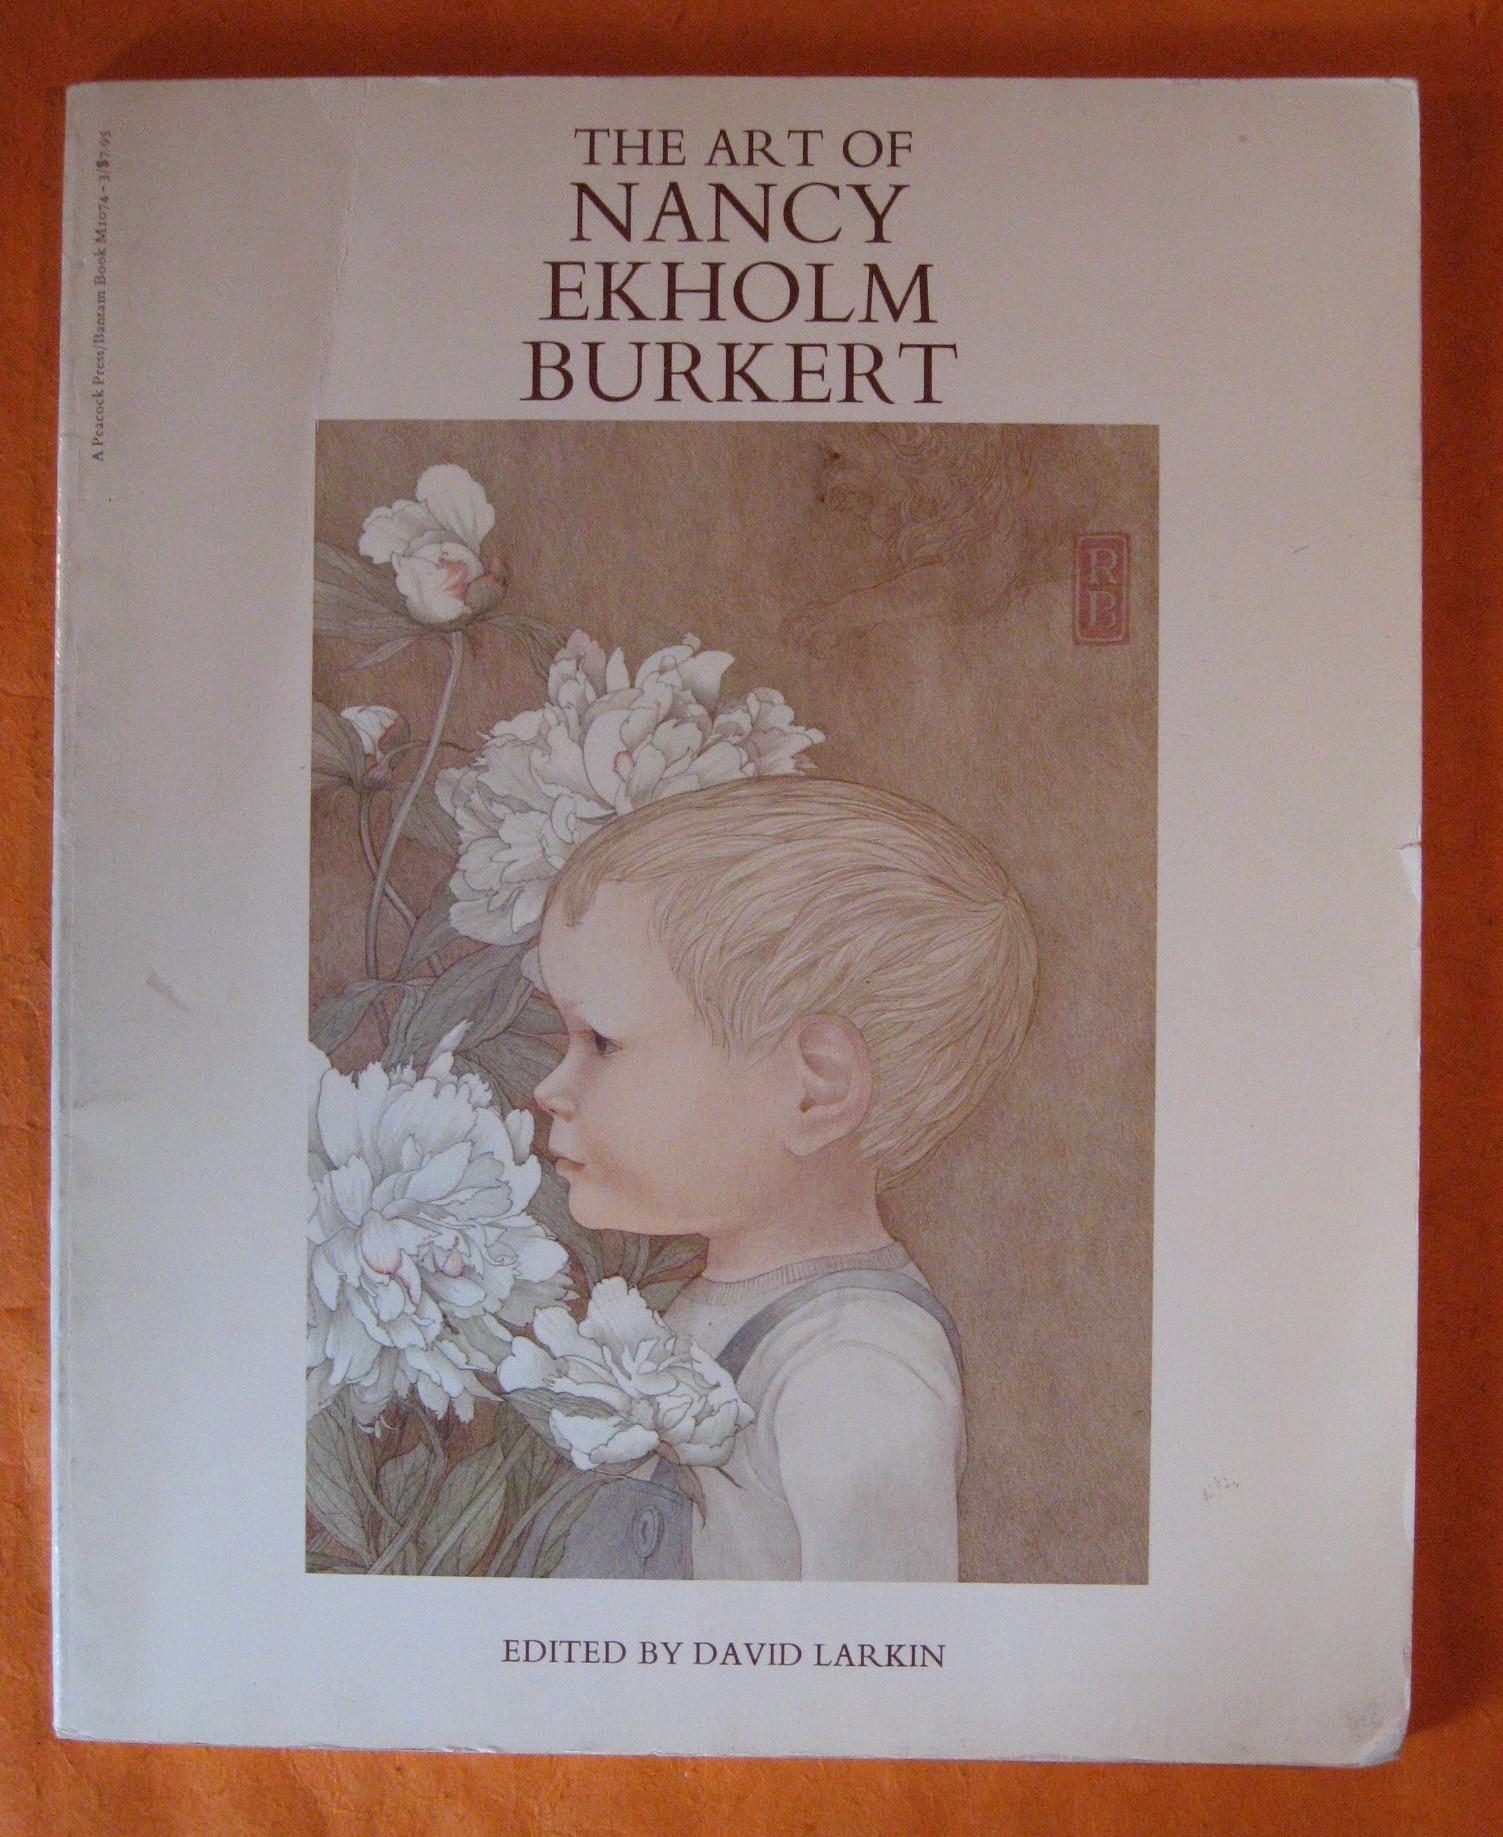 The Art of Nancy Ekholm Burkert, Burkert, Nancy Ekholm; Larkin, David (Ed.)